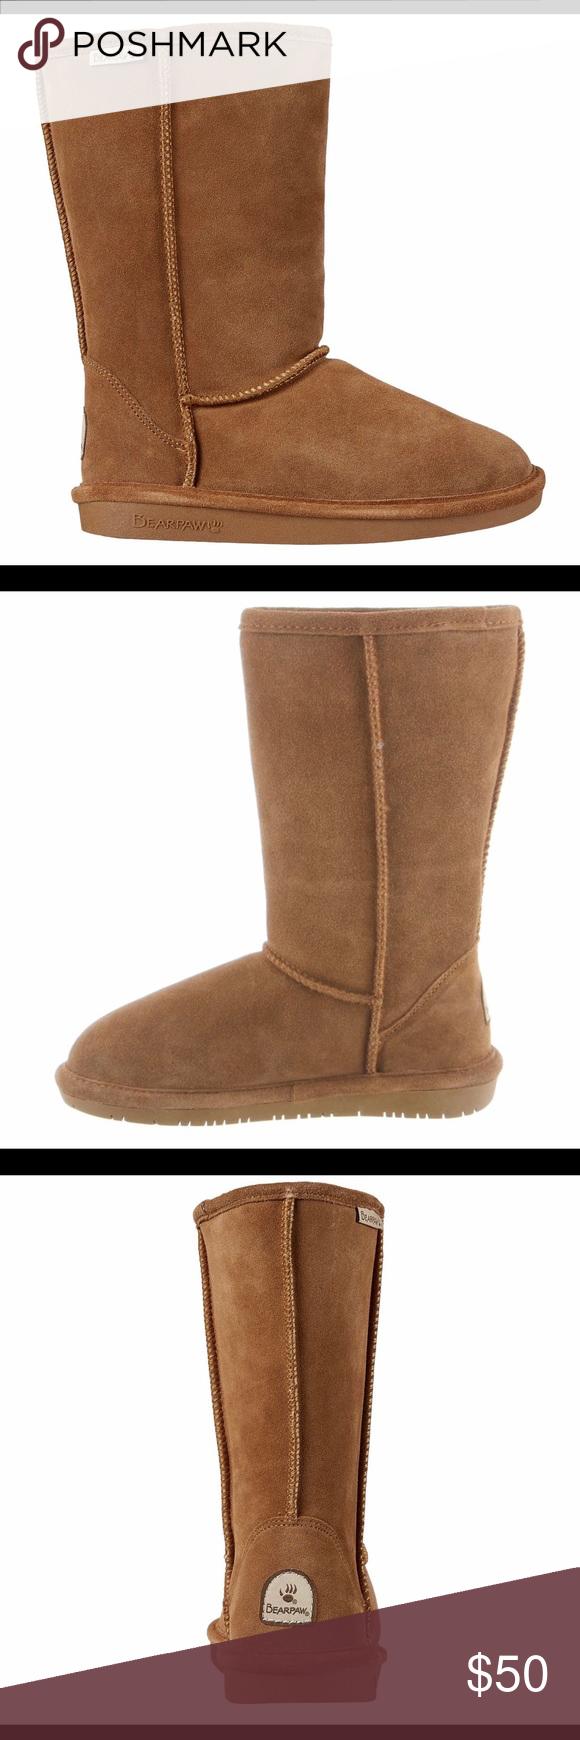 6 BearPaw Women's Eva Winter Boots Size